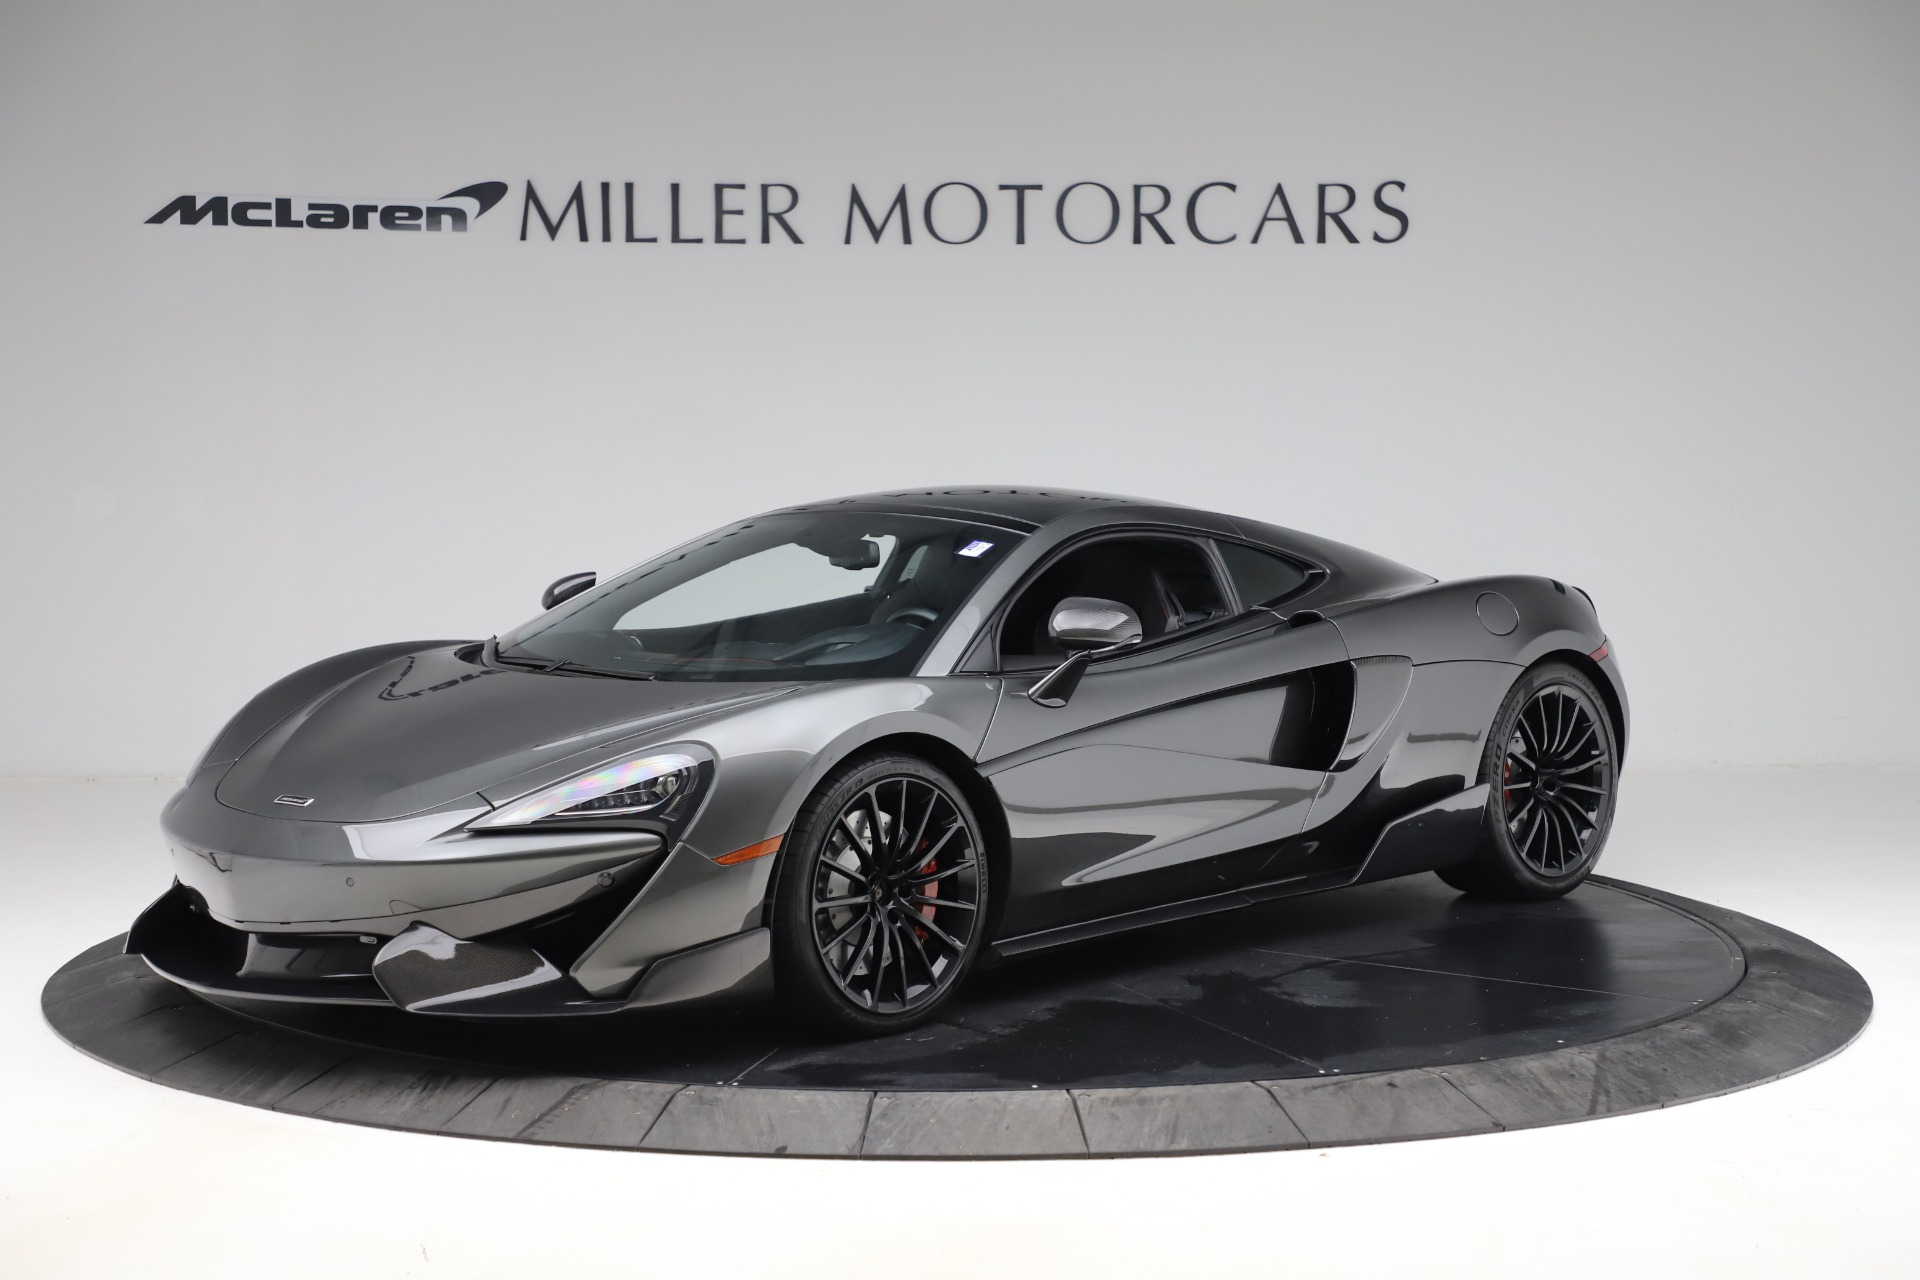 Used 2017 McLaren 570GT for sale $145,900 at Alfa Romeo of Westport in Westport CT 06880 1